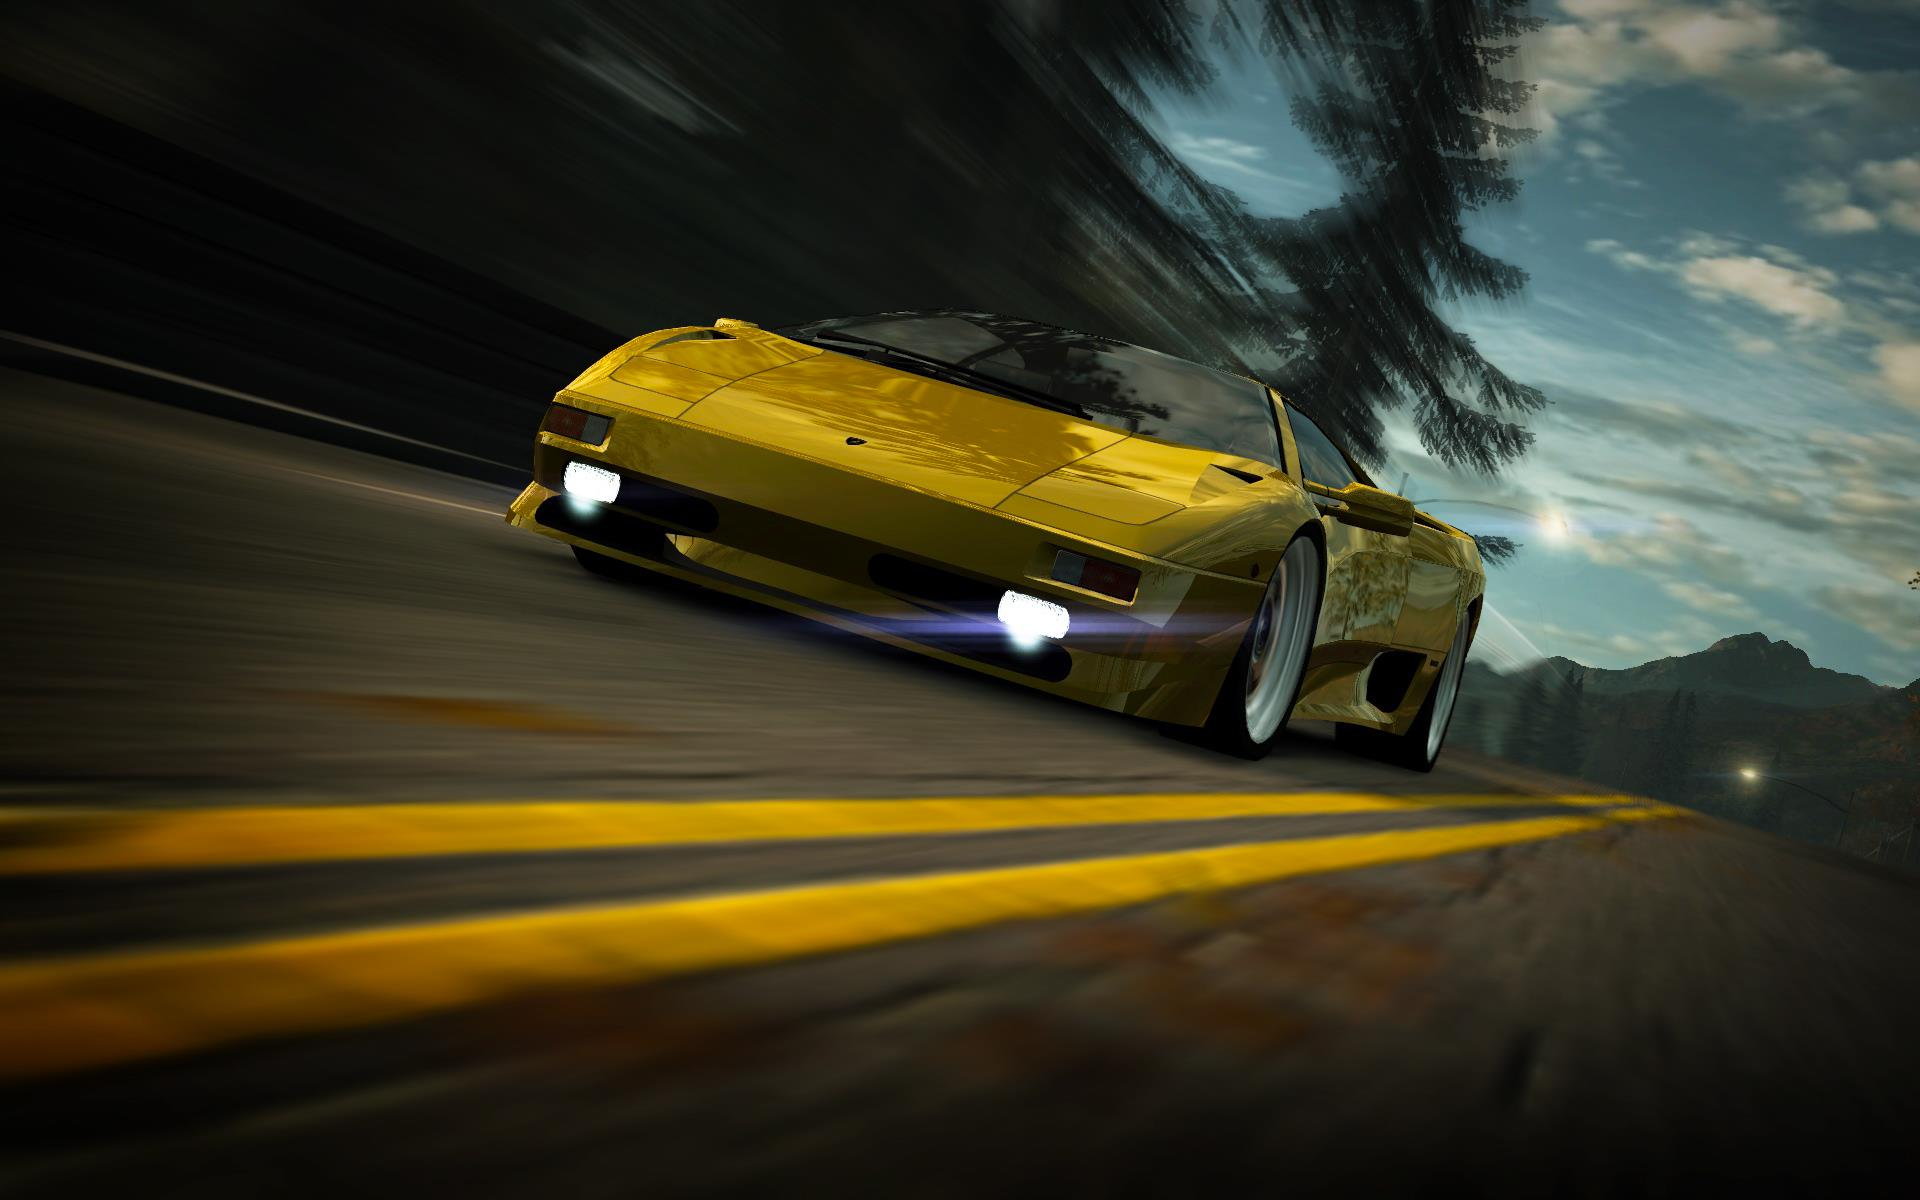 Lamborghini Diablo Sv Nfs World Wiki Fandom Powered By Wikia